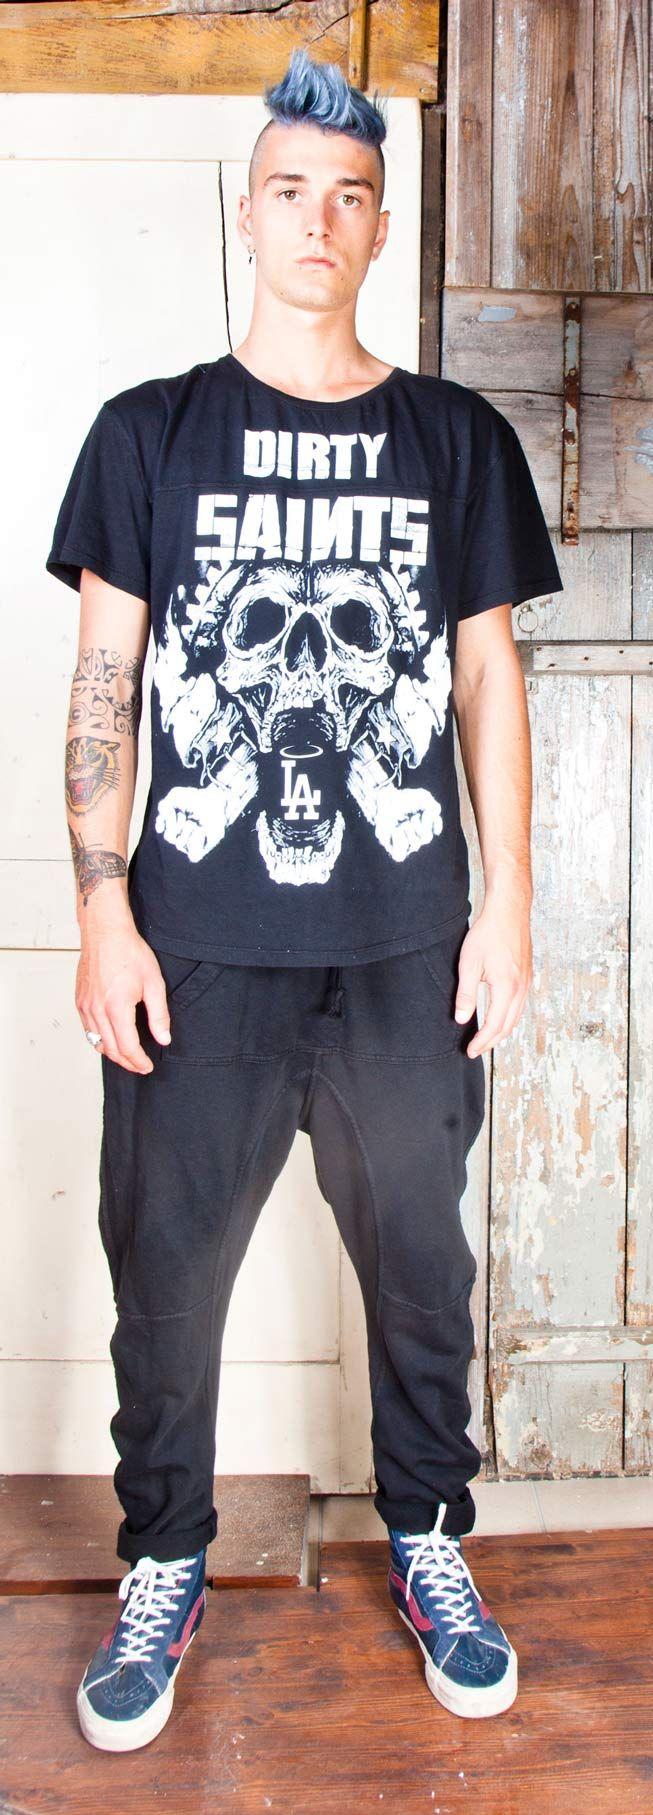 #lasaints #fashion #collection #fallwinter #fashionweek #losangeles #tshirt #jersey #clothing #menswear